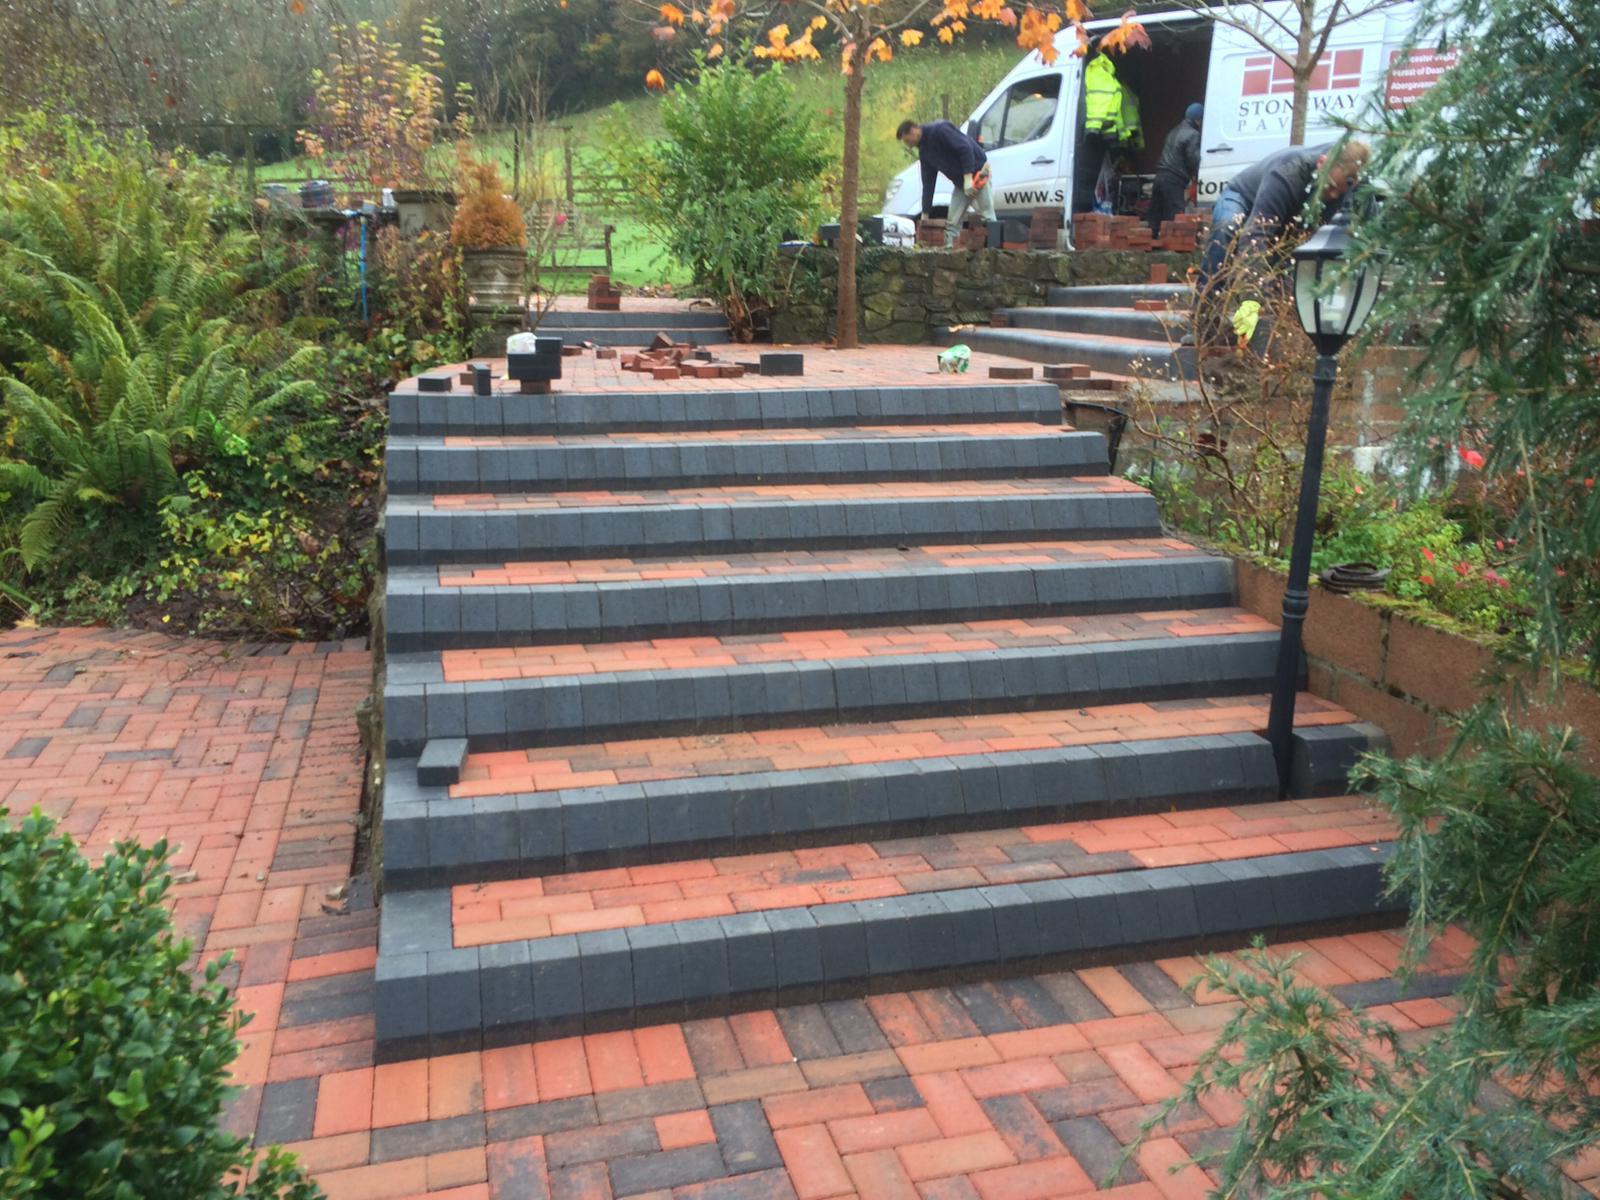 Garden Landscaping & Garden Design, Grey & Red Block Paving